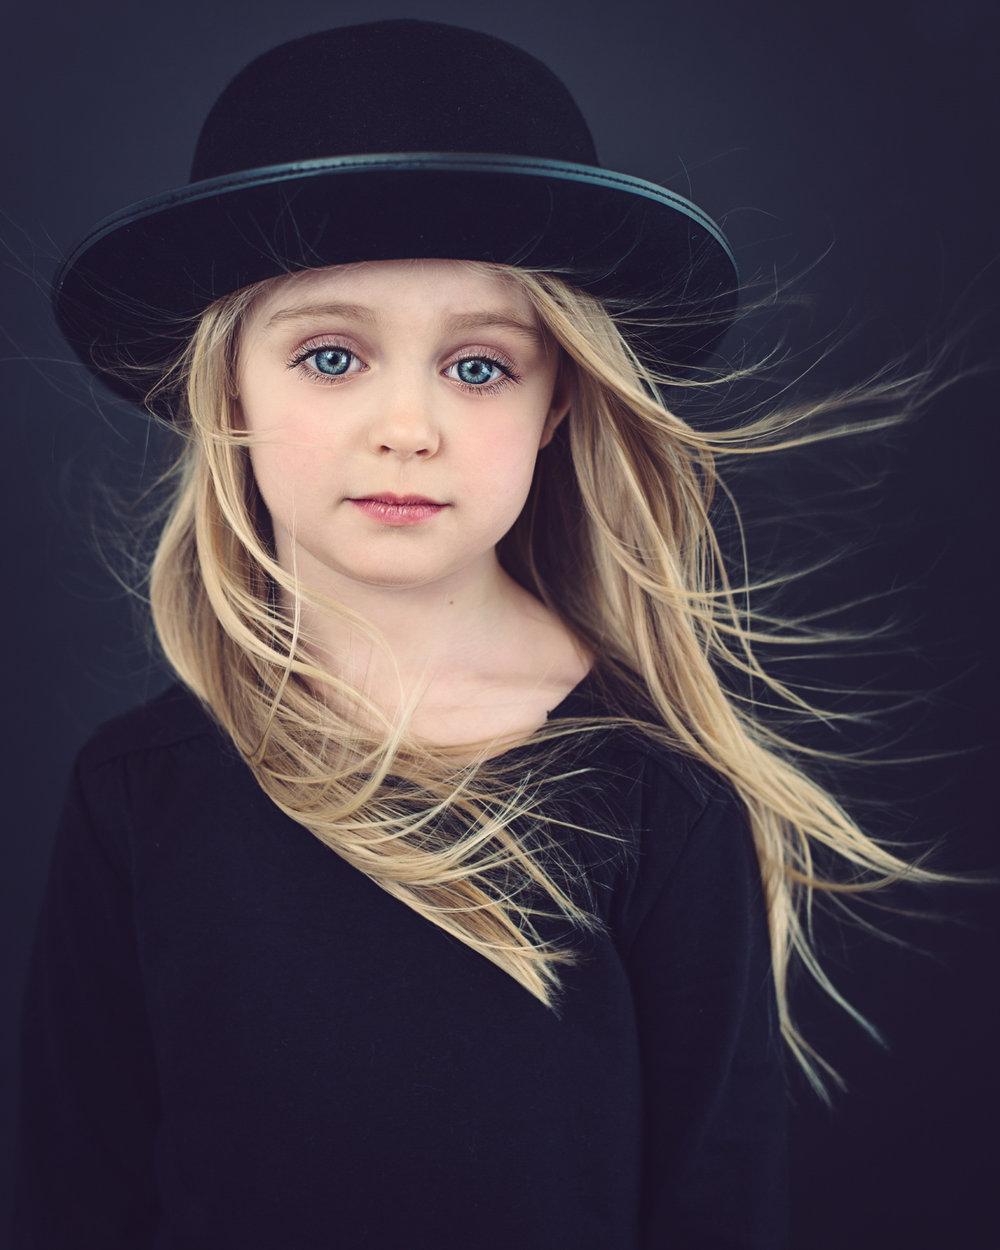 Little Black Hat, Kim Boustany, Lafayette PS, 2nd